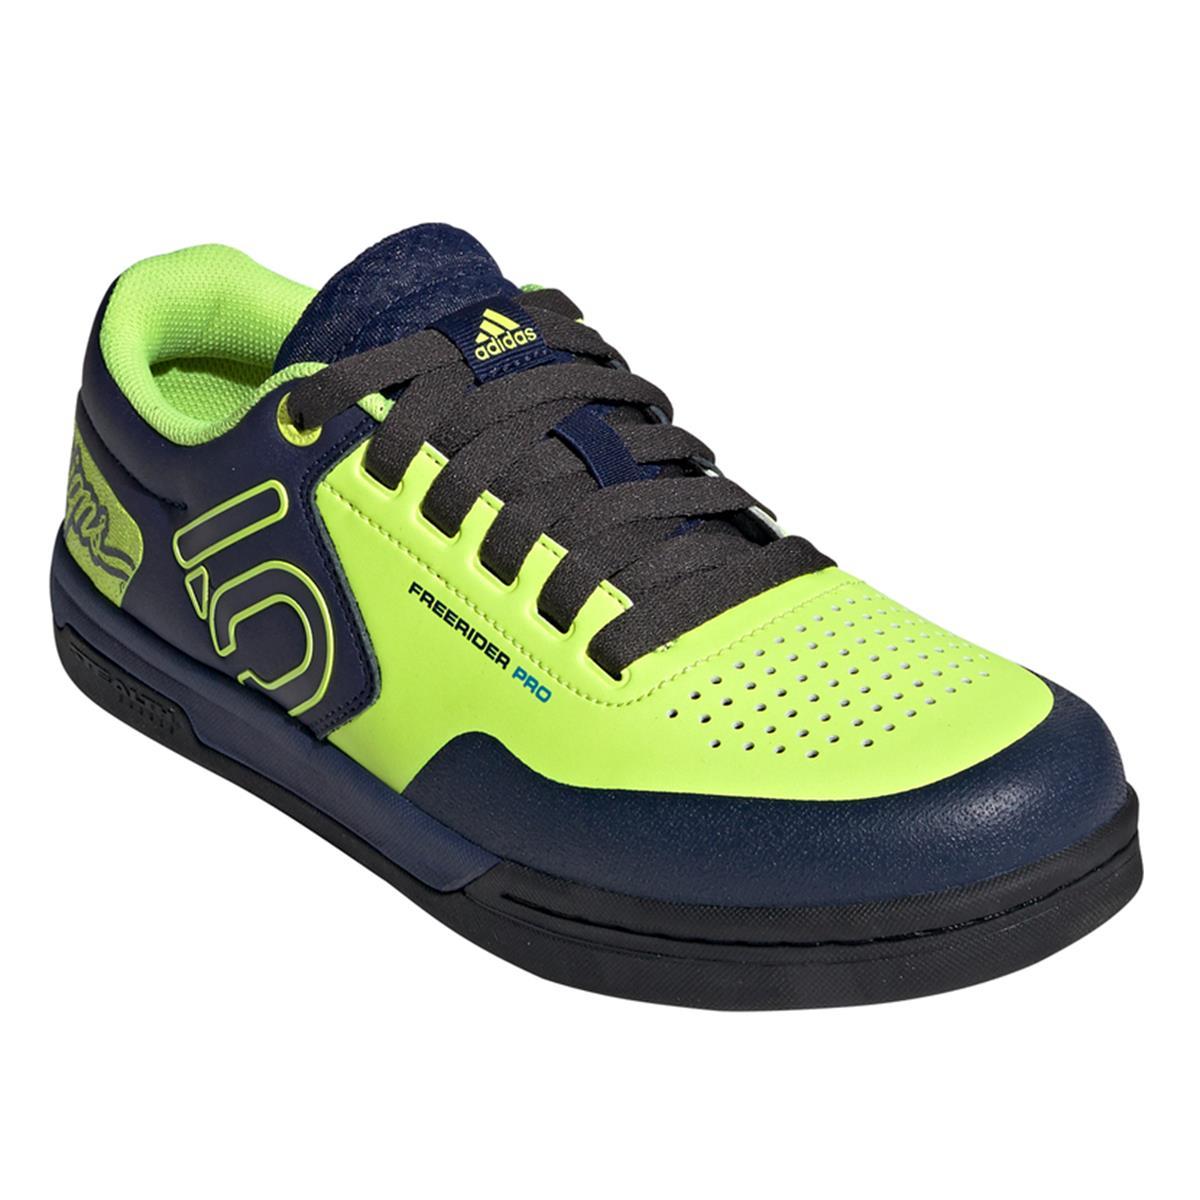 Five Ten Bike Shoes Freerider Pro Clipless TLD Solar YellowCarbon